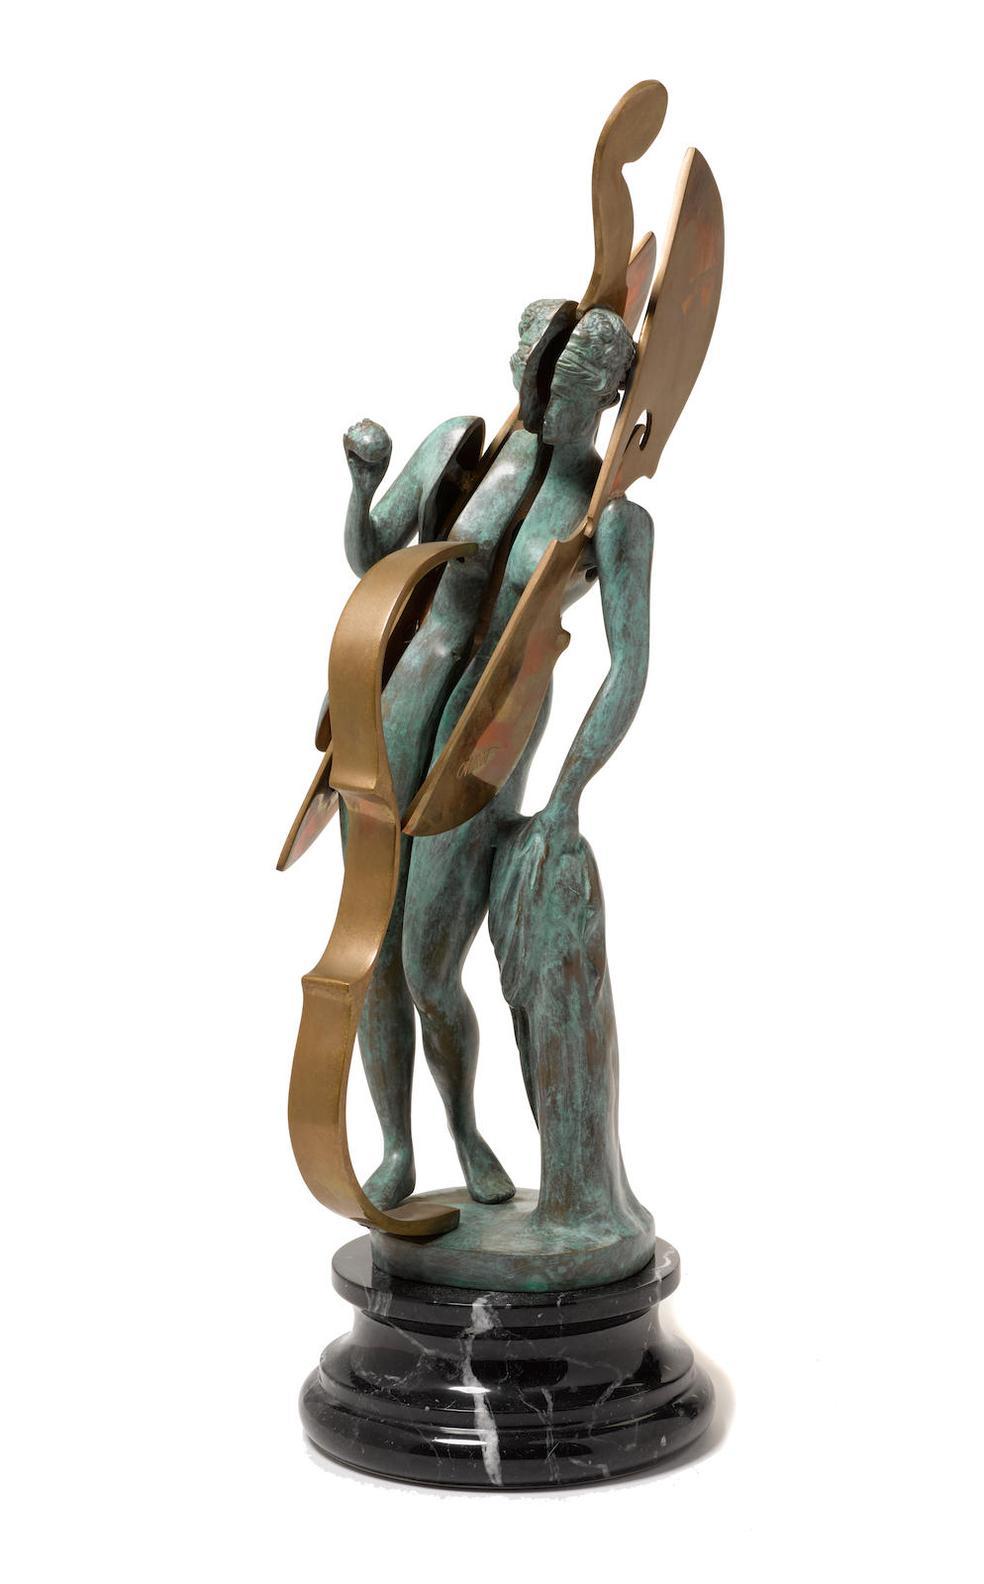 Arman-Untitled-2000